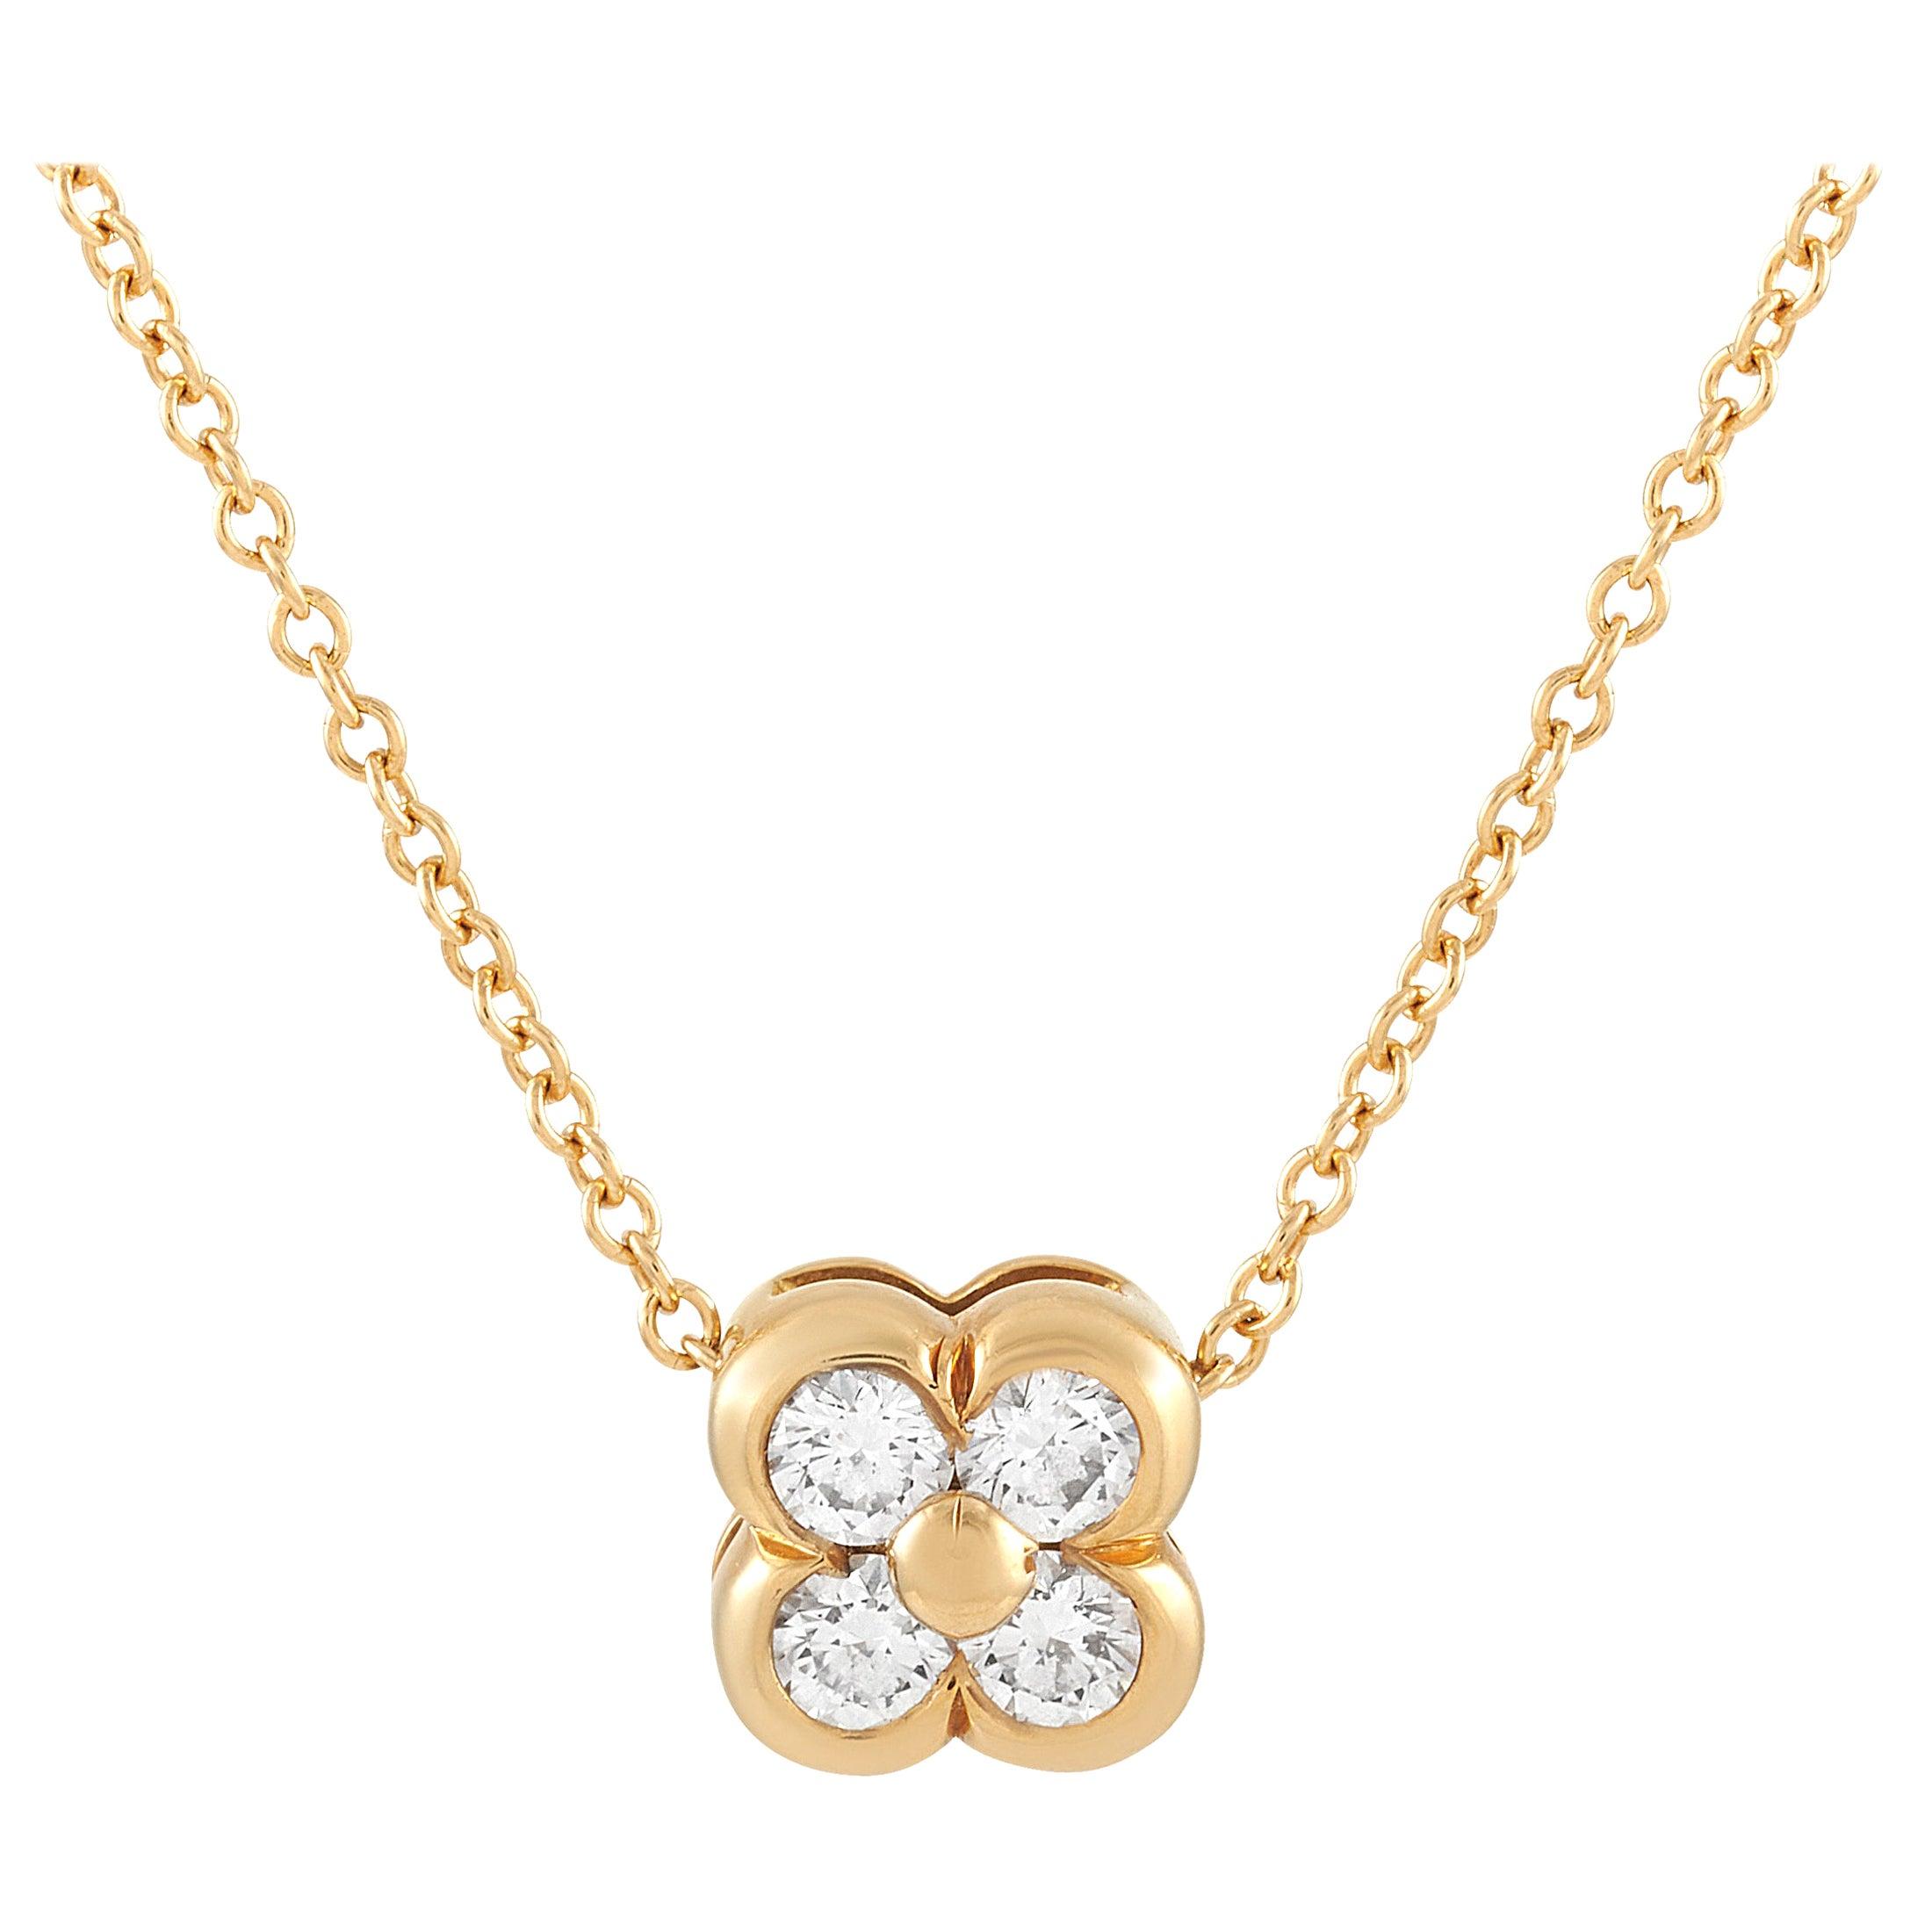 Tiffany & Co. 18 Karat Yellow Gold 0.20 Carat Diamond Clover Pendant Necklace